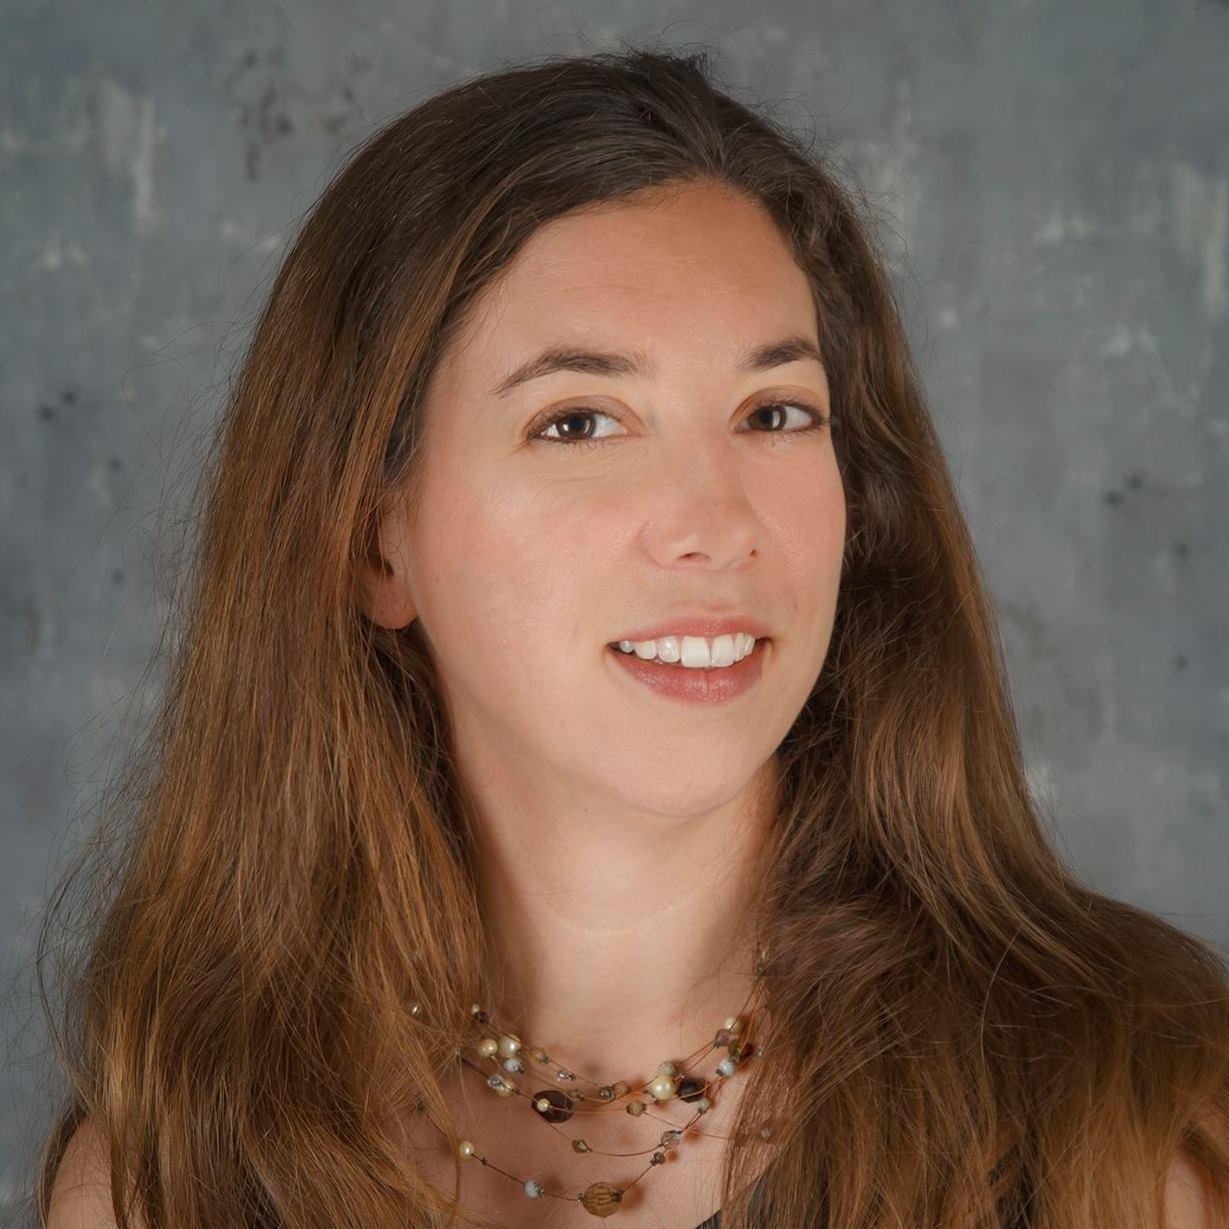 Inge Natalie Hol